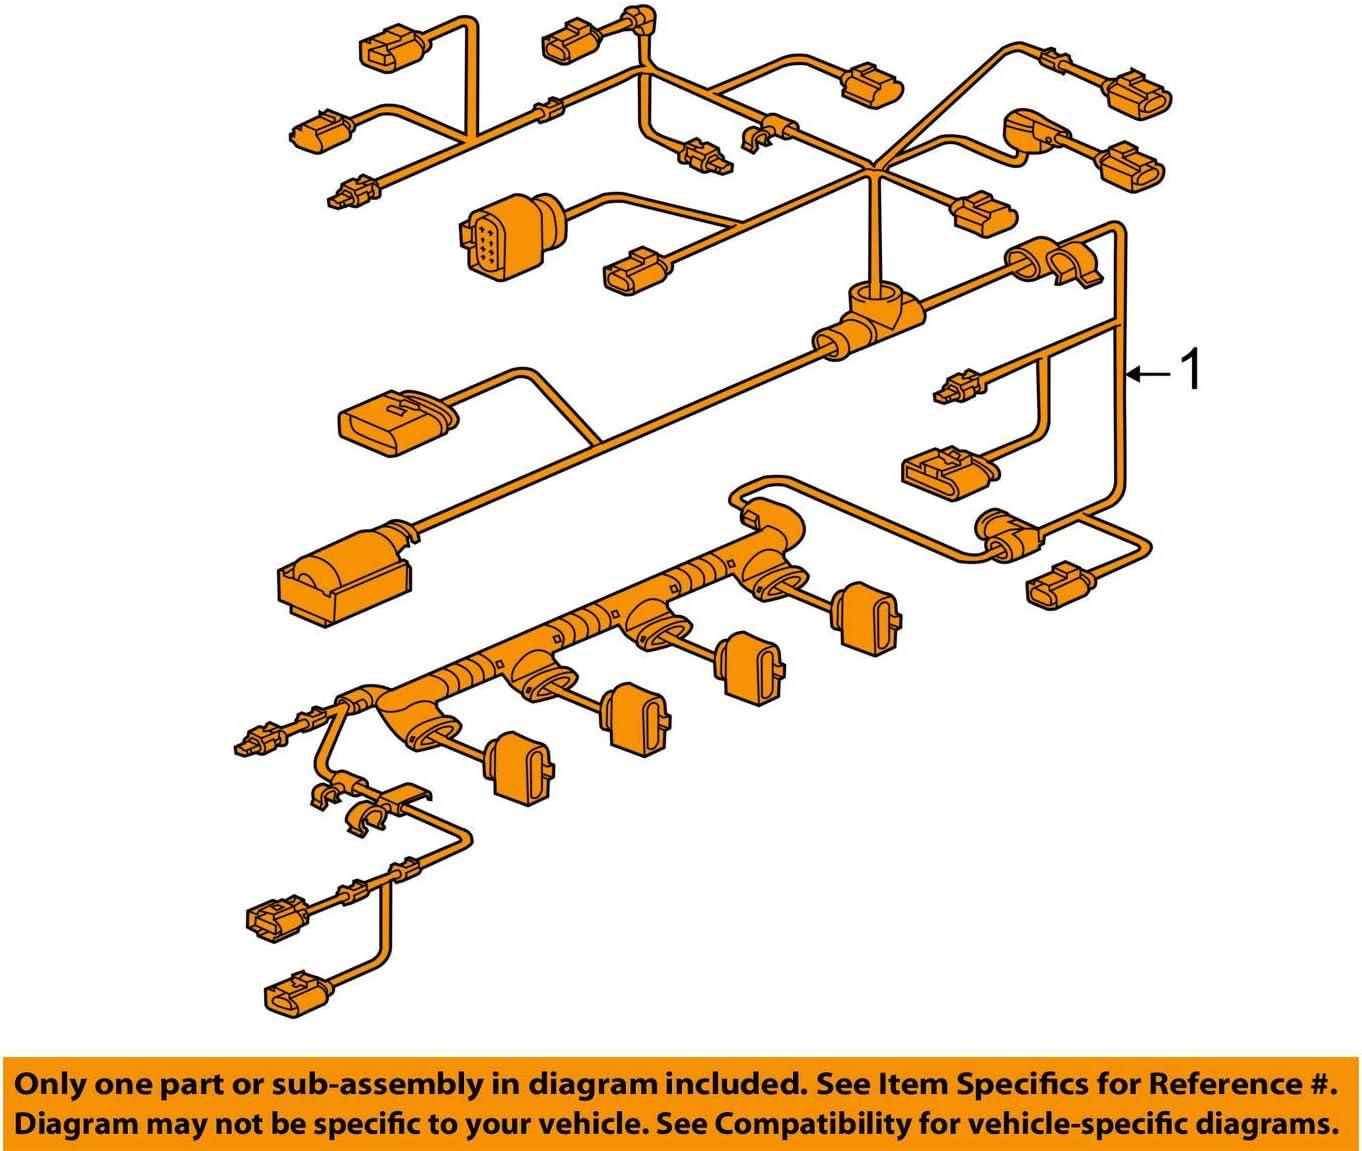 Amazon.com: 2012-2014 Volkswagen Jetta Engine Harness 06J-971-627-F:  Automotive | 2014 Vw Jetta Wire Harness |  | Amazon.com